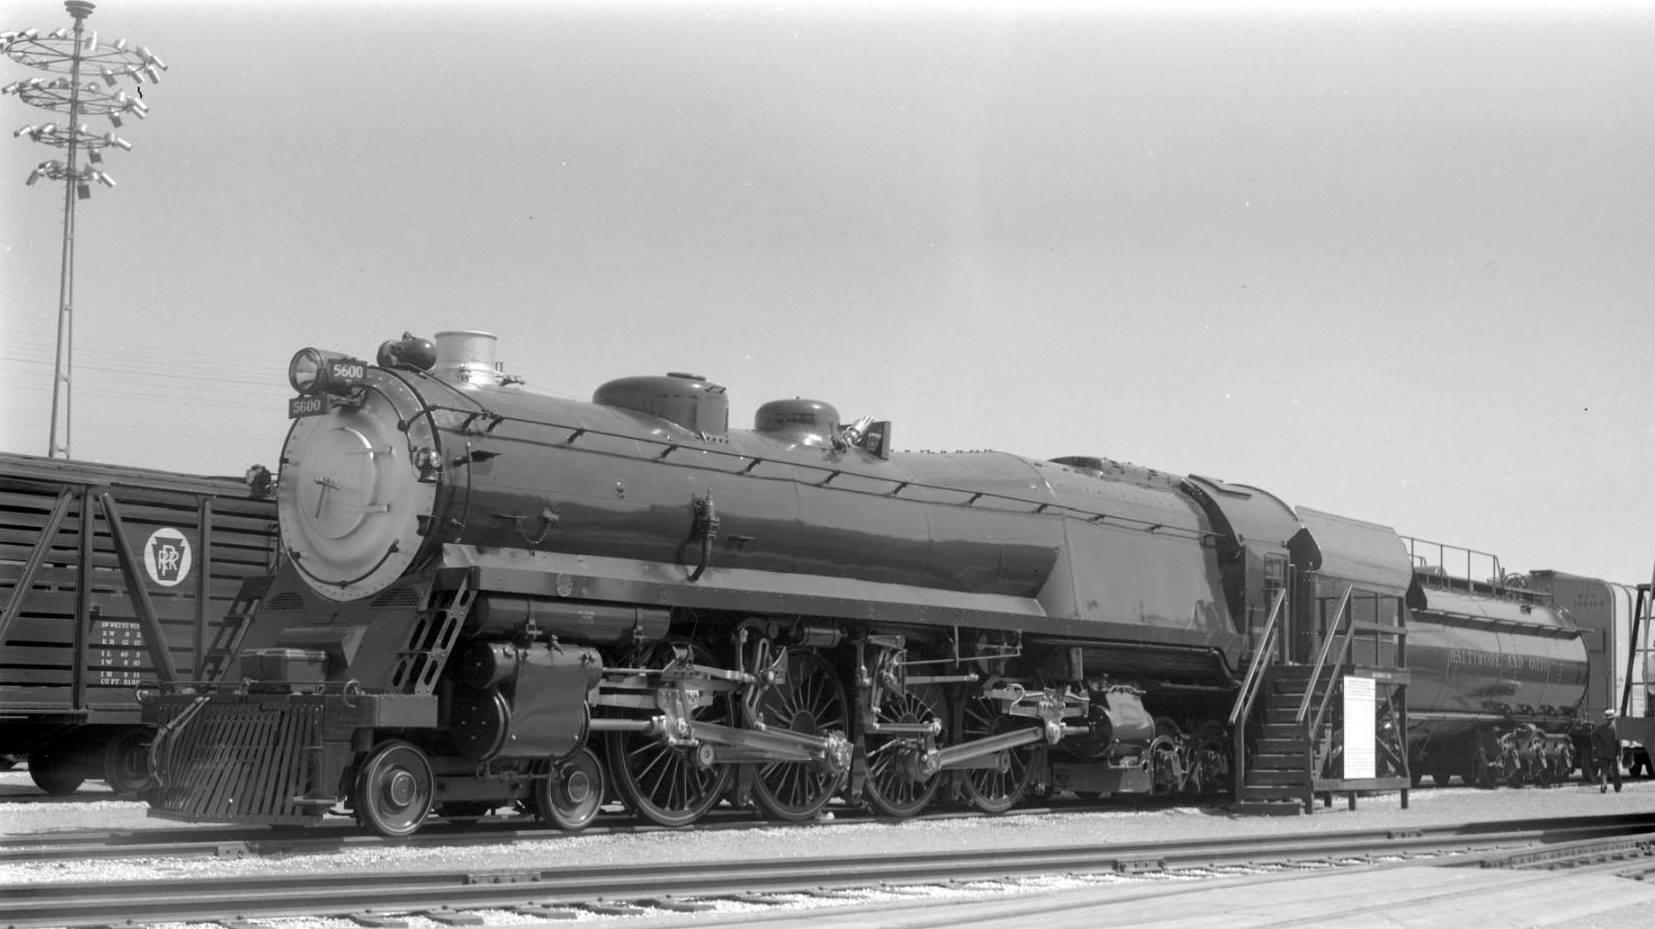 Bodupledrionfslk on Steam Locomotive Valve Gear